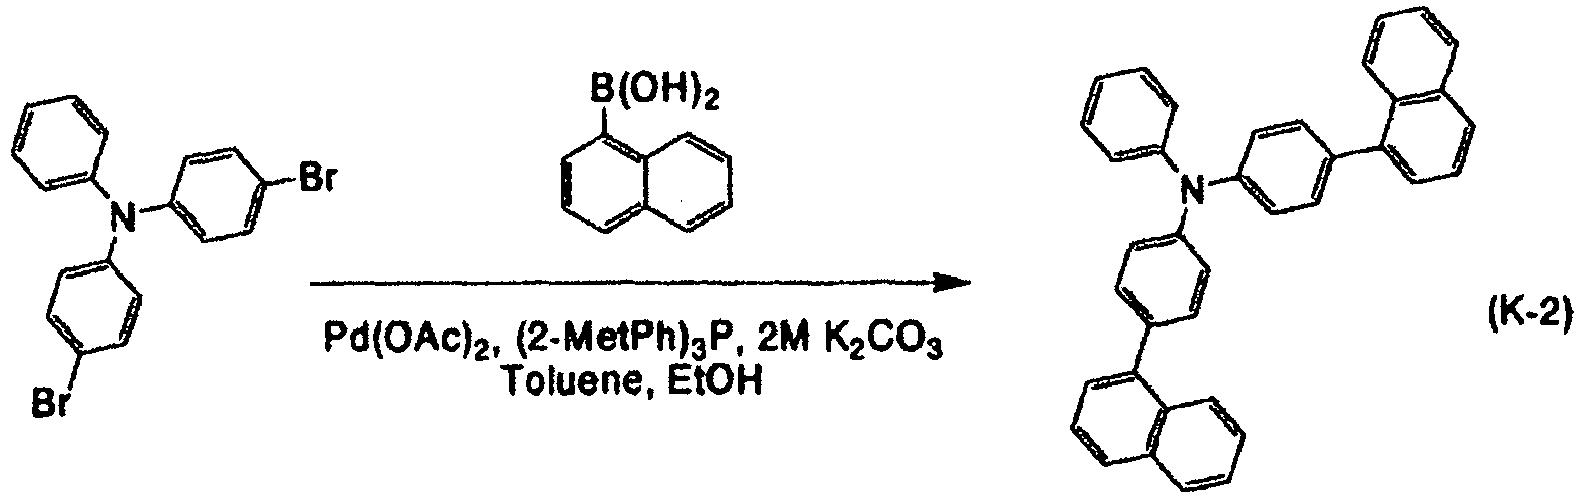 Figure imgb0114